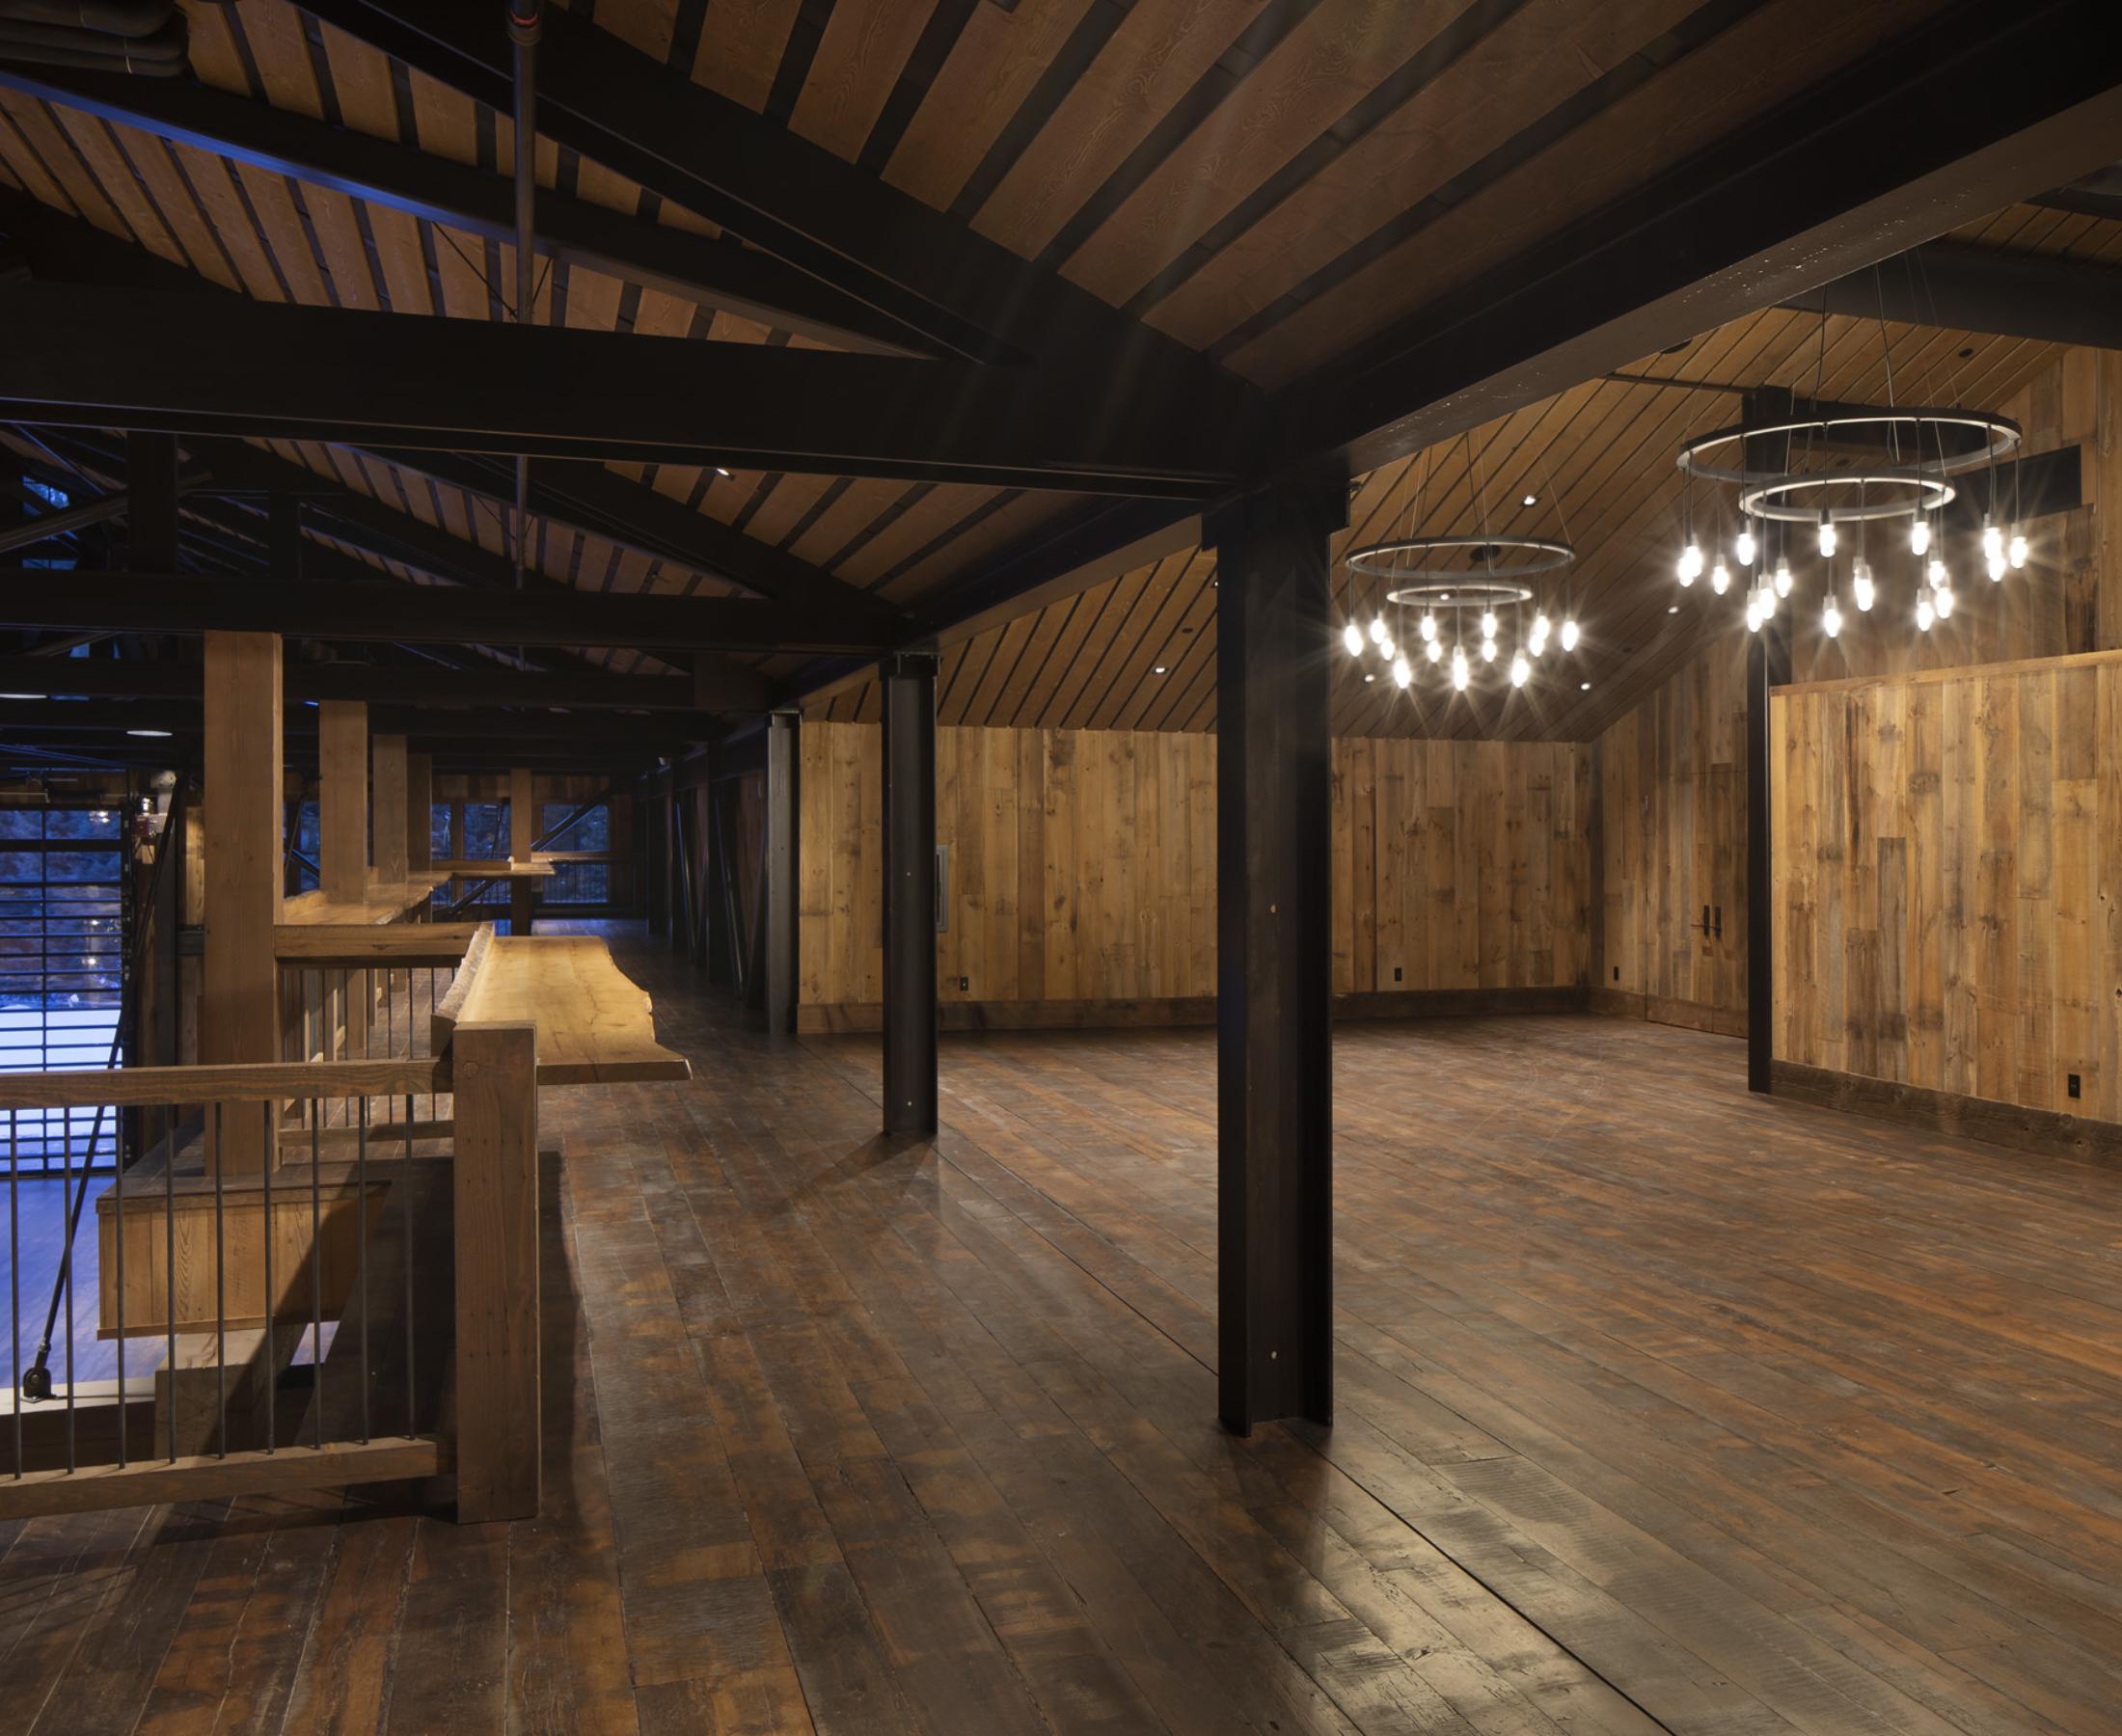 Yc 2002 Barn Interiors 0045 Jpeg Web Portfolio